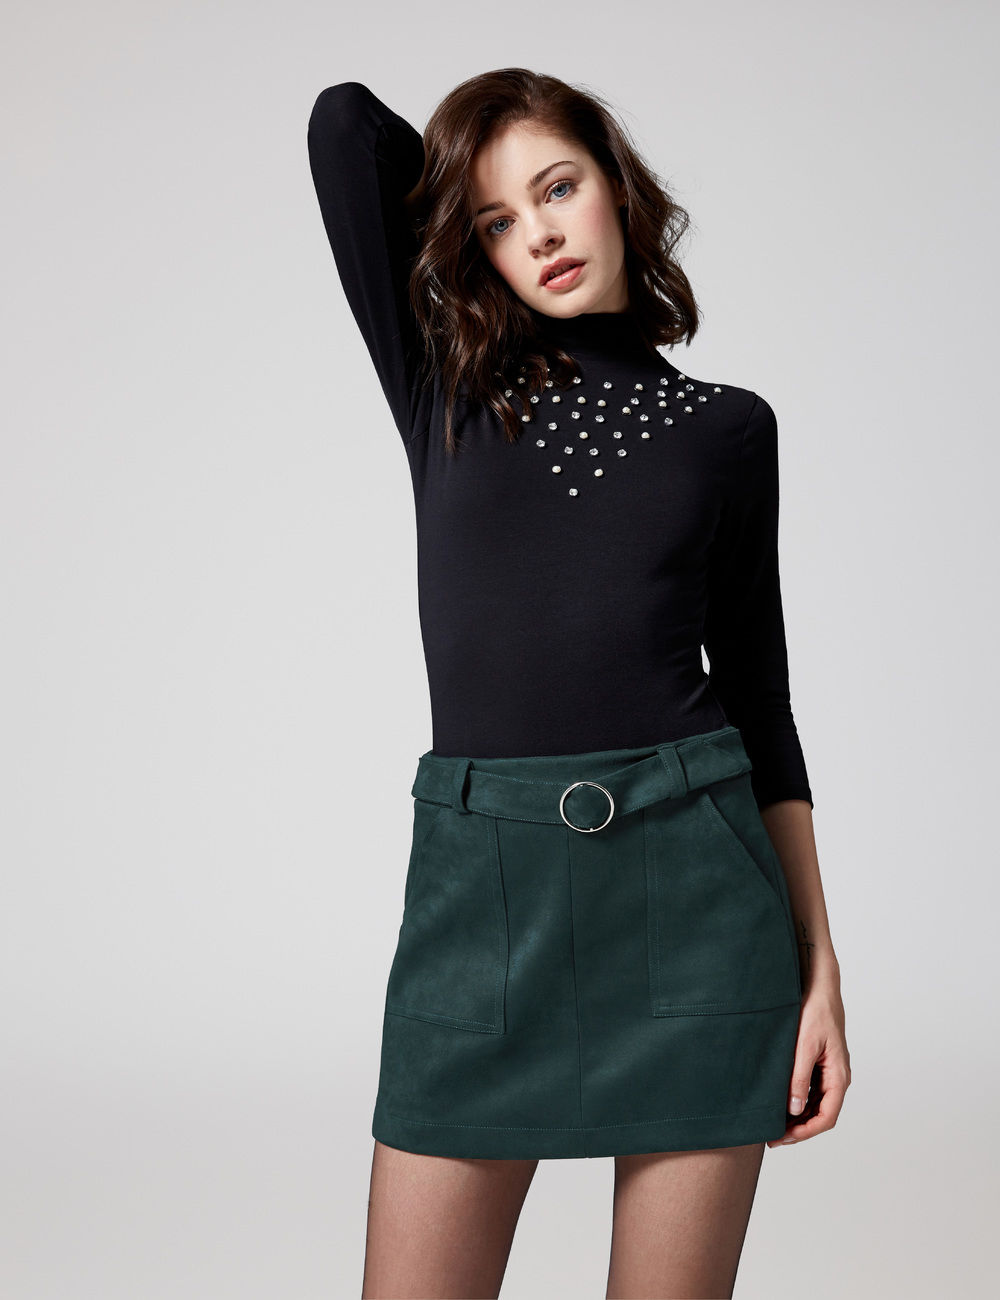 jupe suédine avec ceinture verte Jennyfer prix 17,99 €